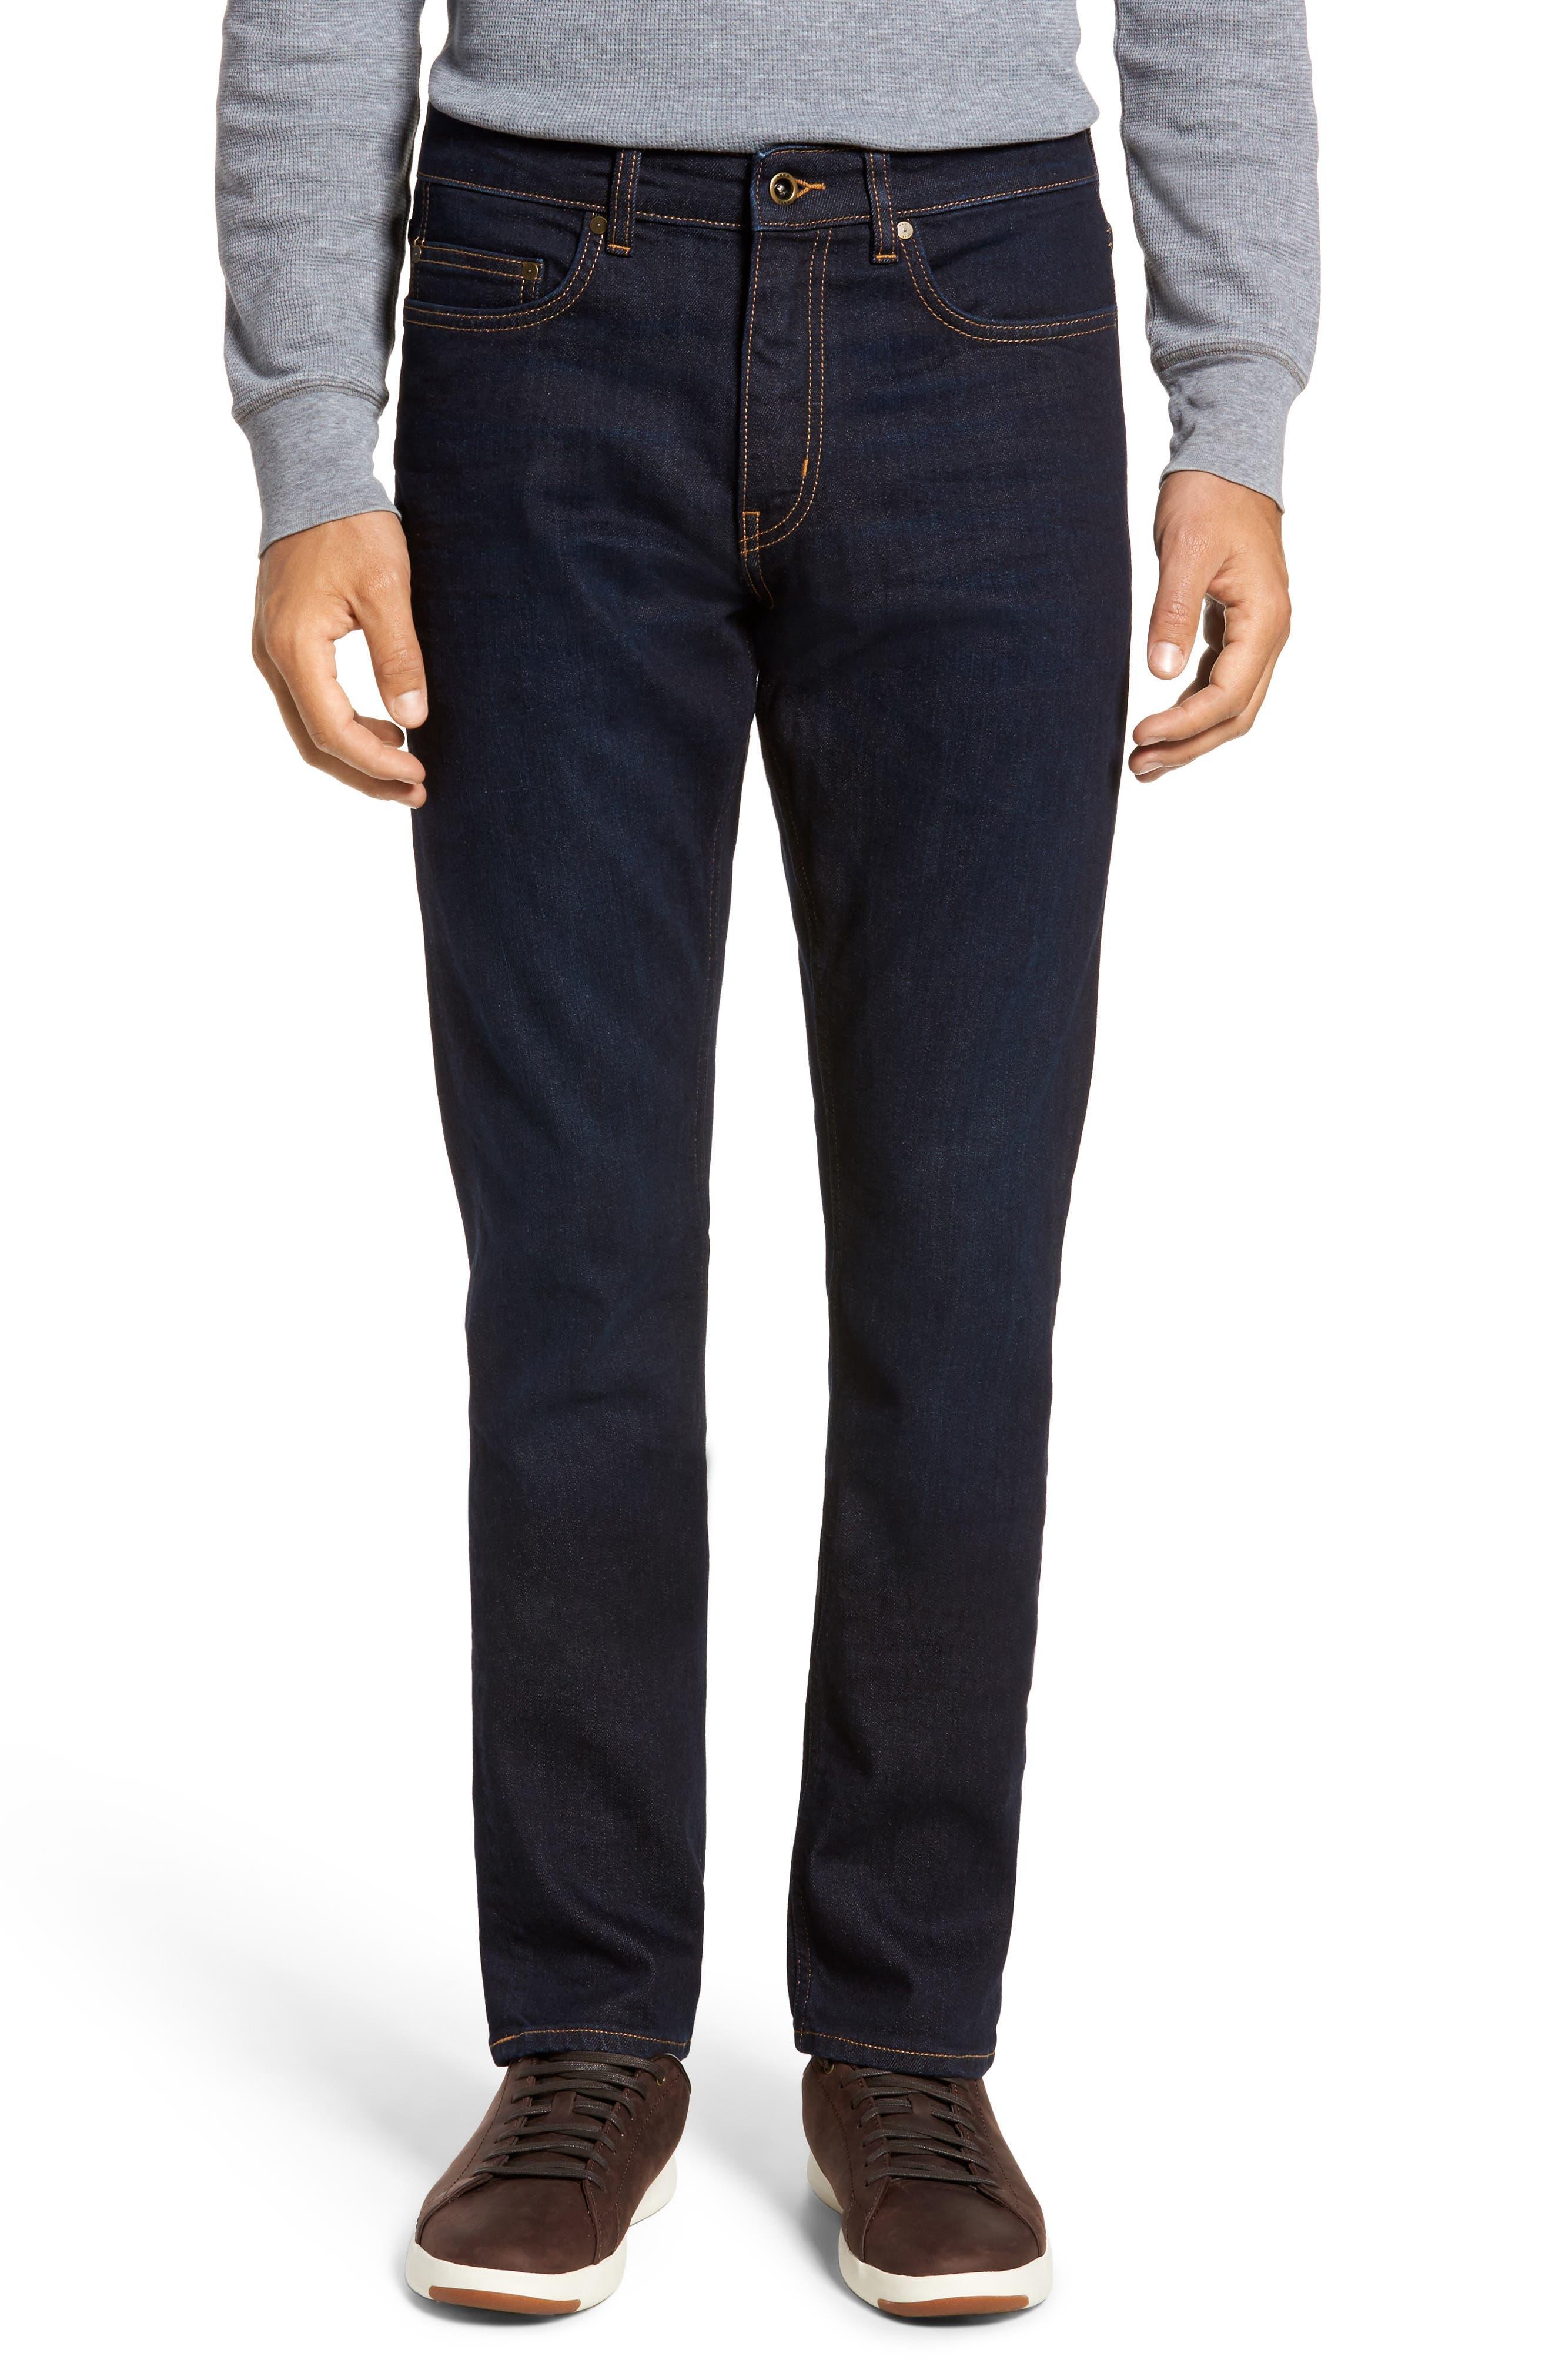 Main Image - Rodd & Gunn Fanshawe Straight Leg Jeans